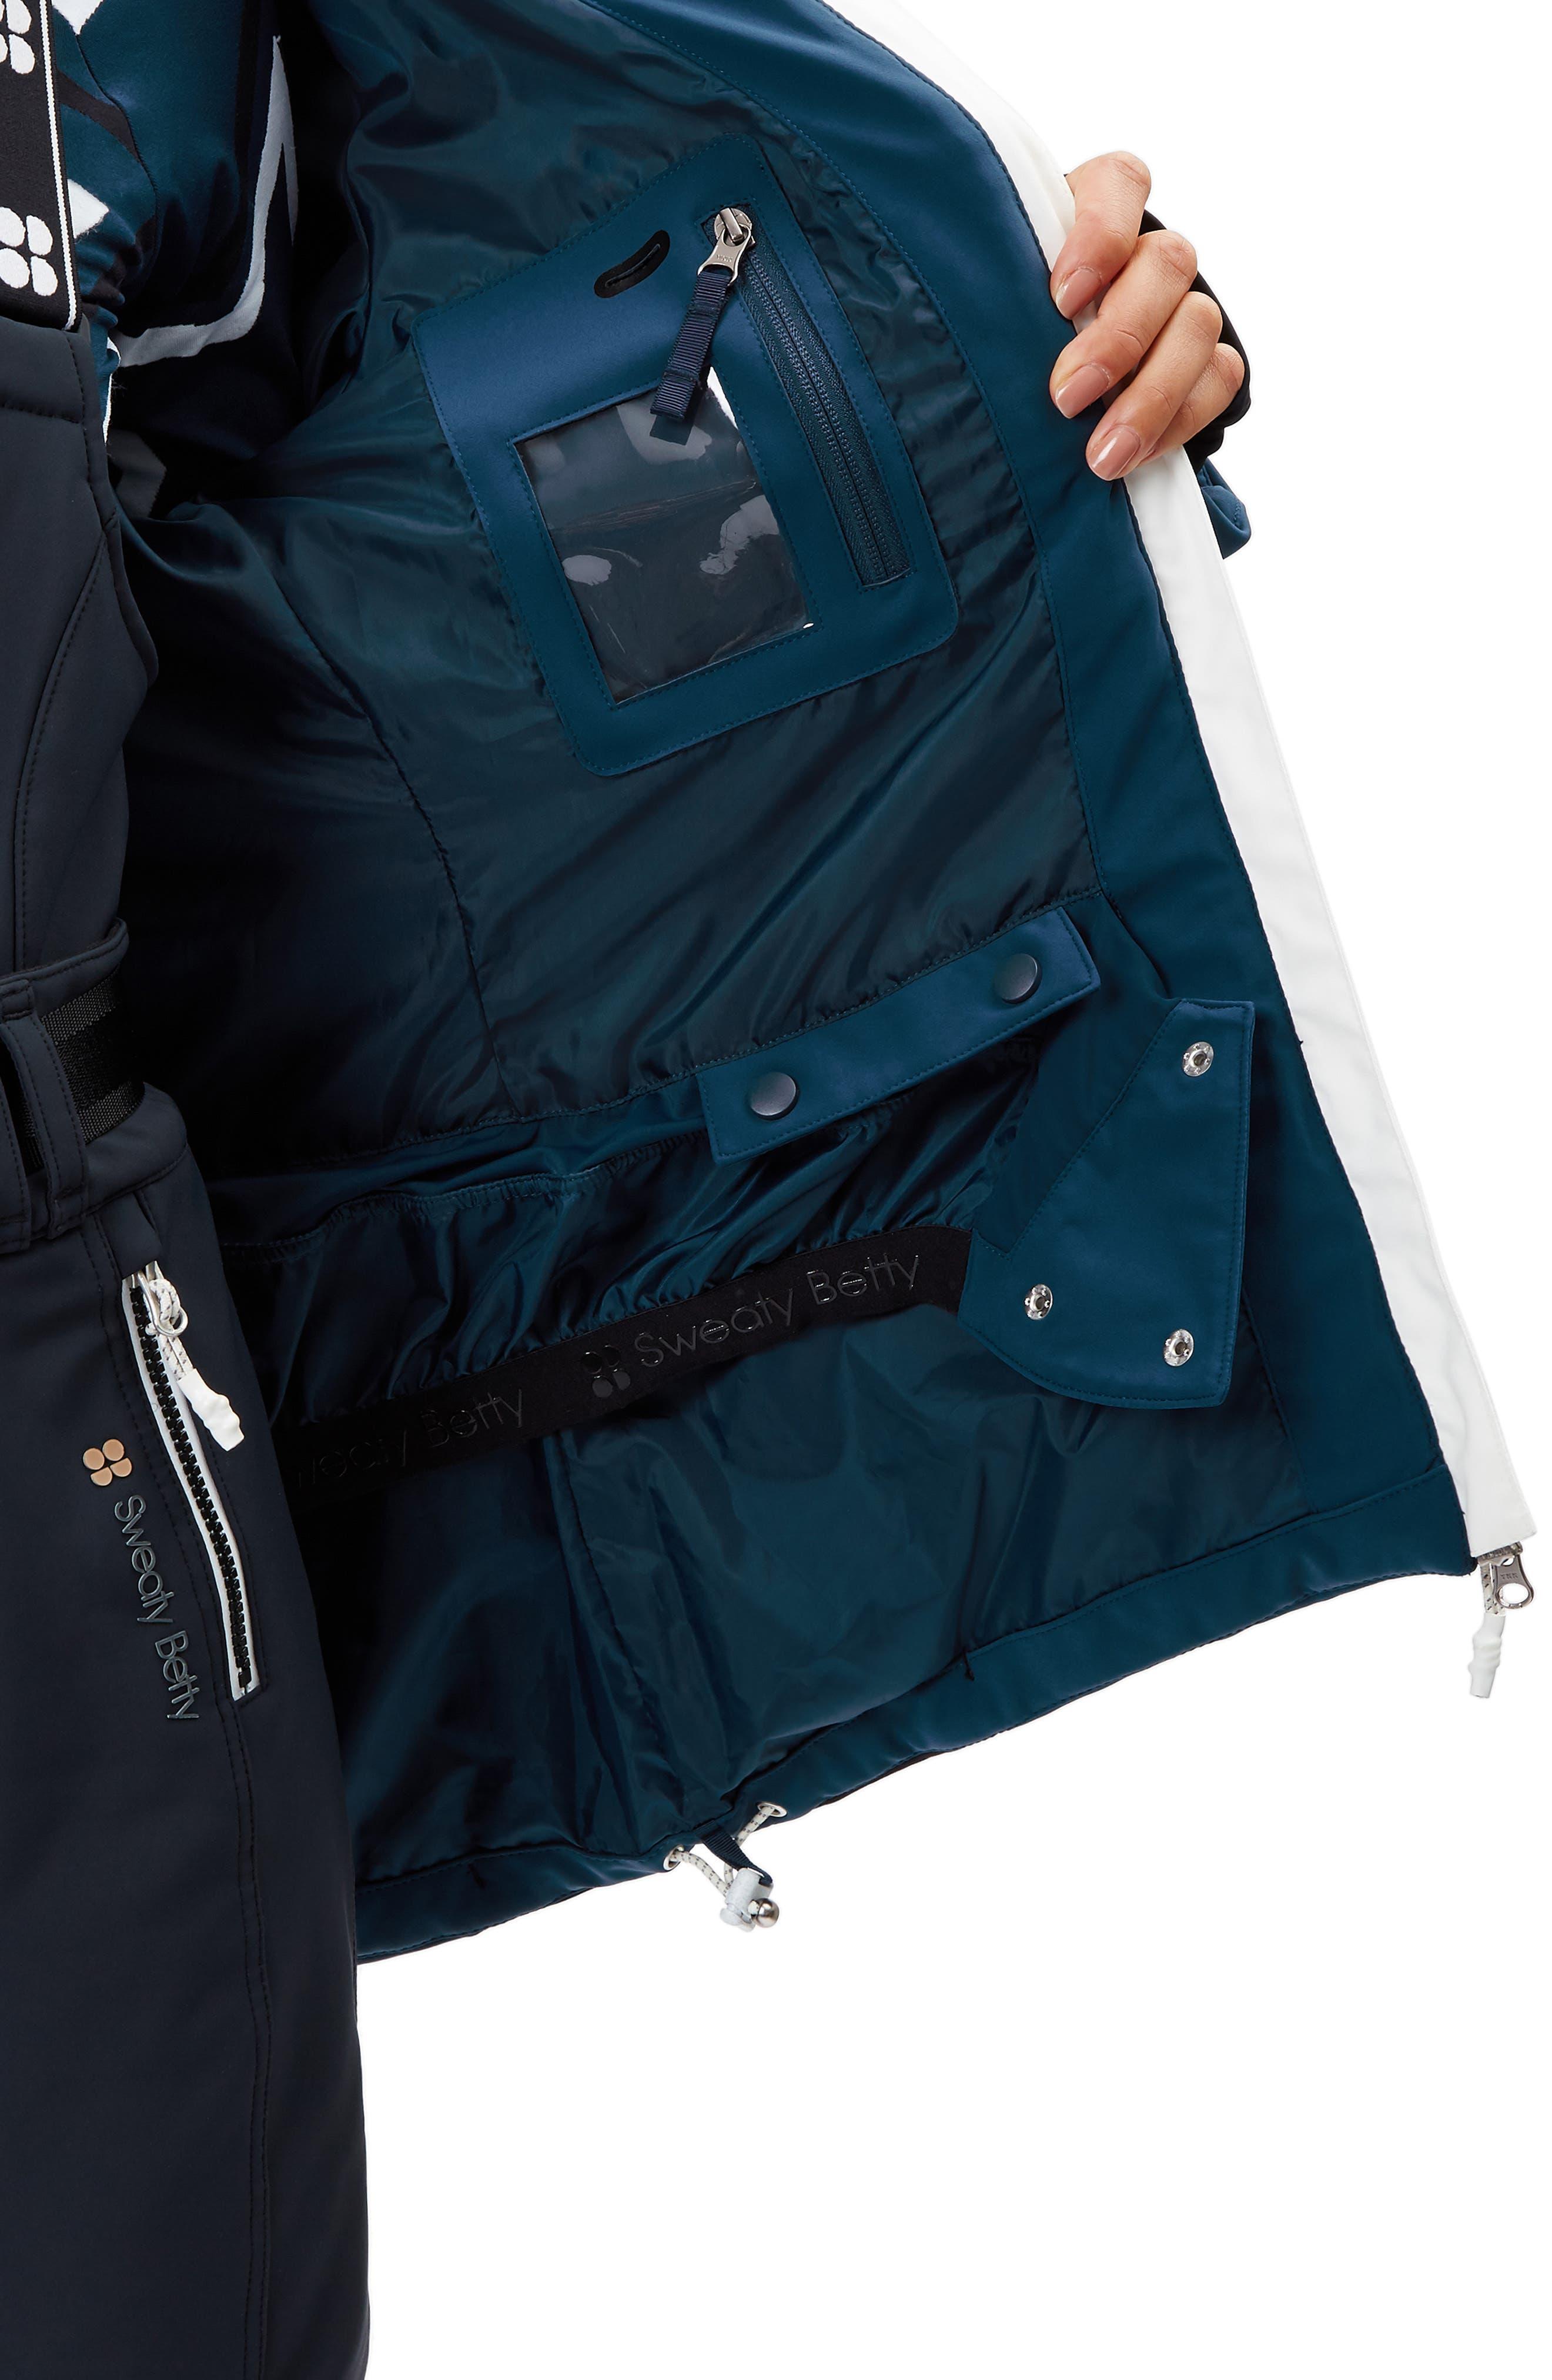 SWEATY BETTY, Method Hybrid Waterproof Ski Jacket with Faux Fur, Alternate thumbnail 5, color, BEETLE BLUE COLOUR BLOCK